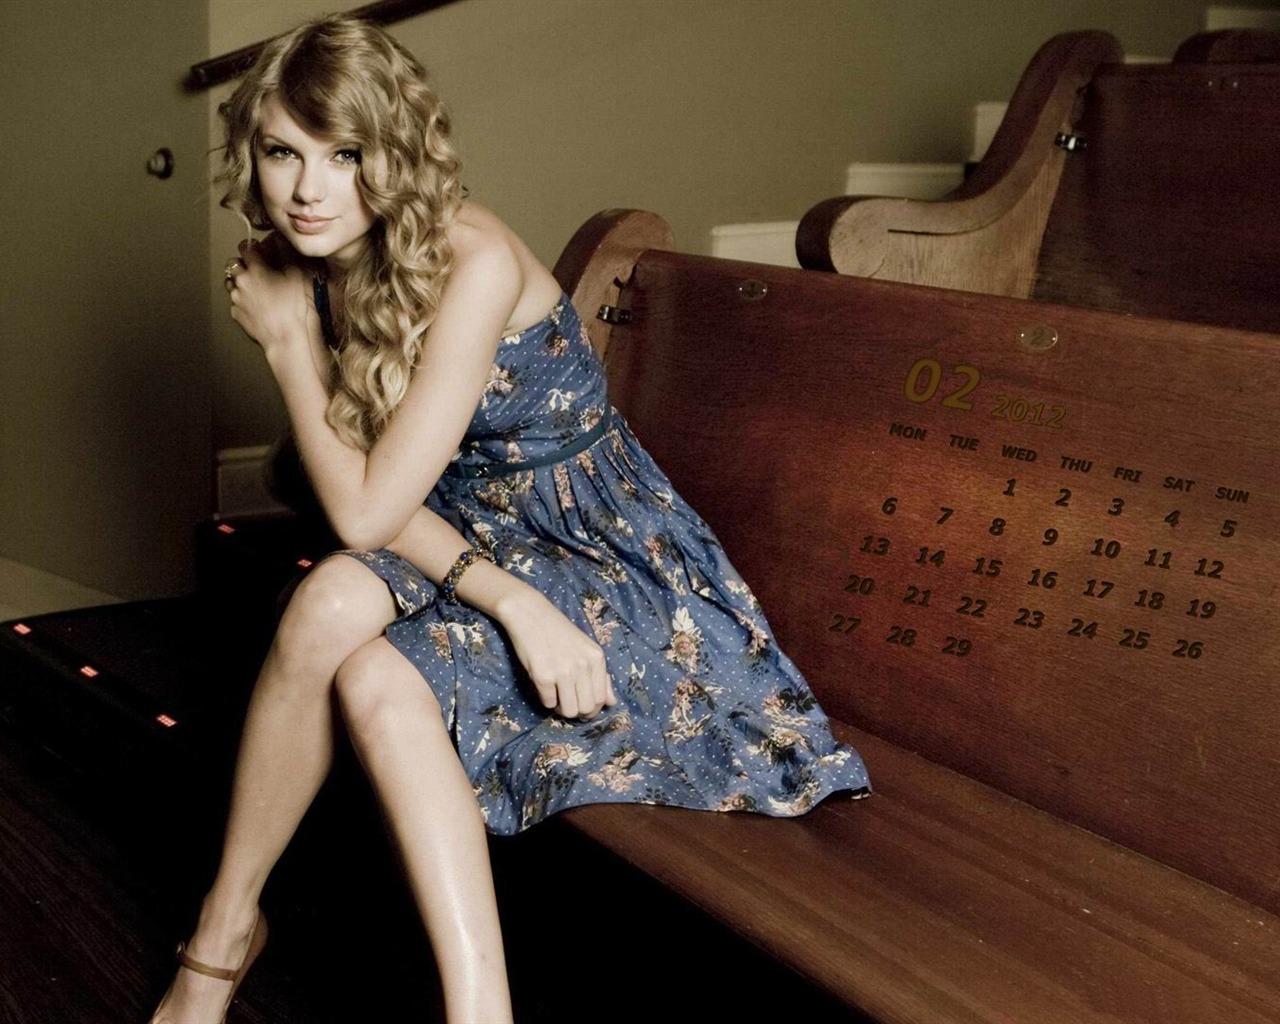 Taylor Swift 2012 Calendar Taylor Swift February 2012